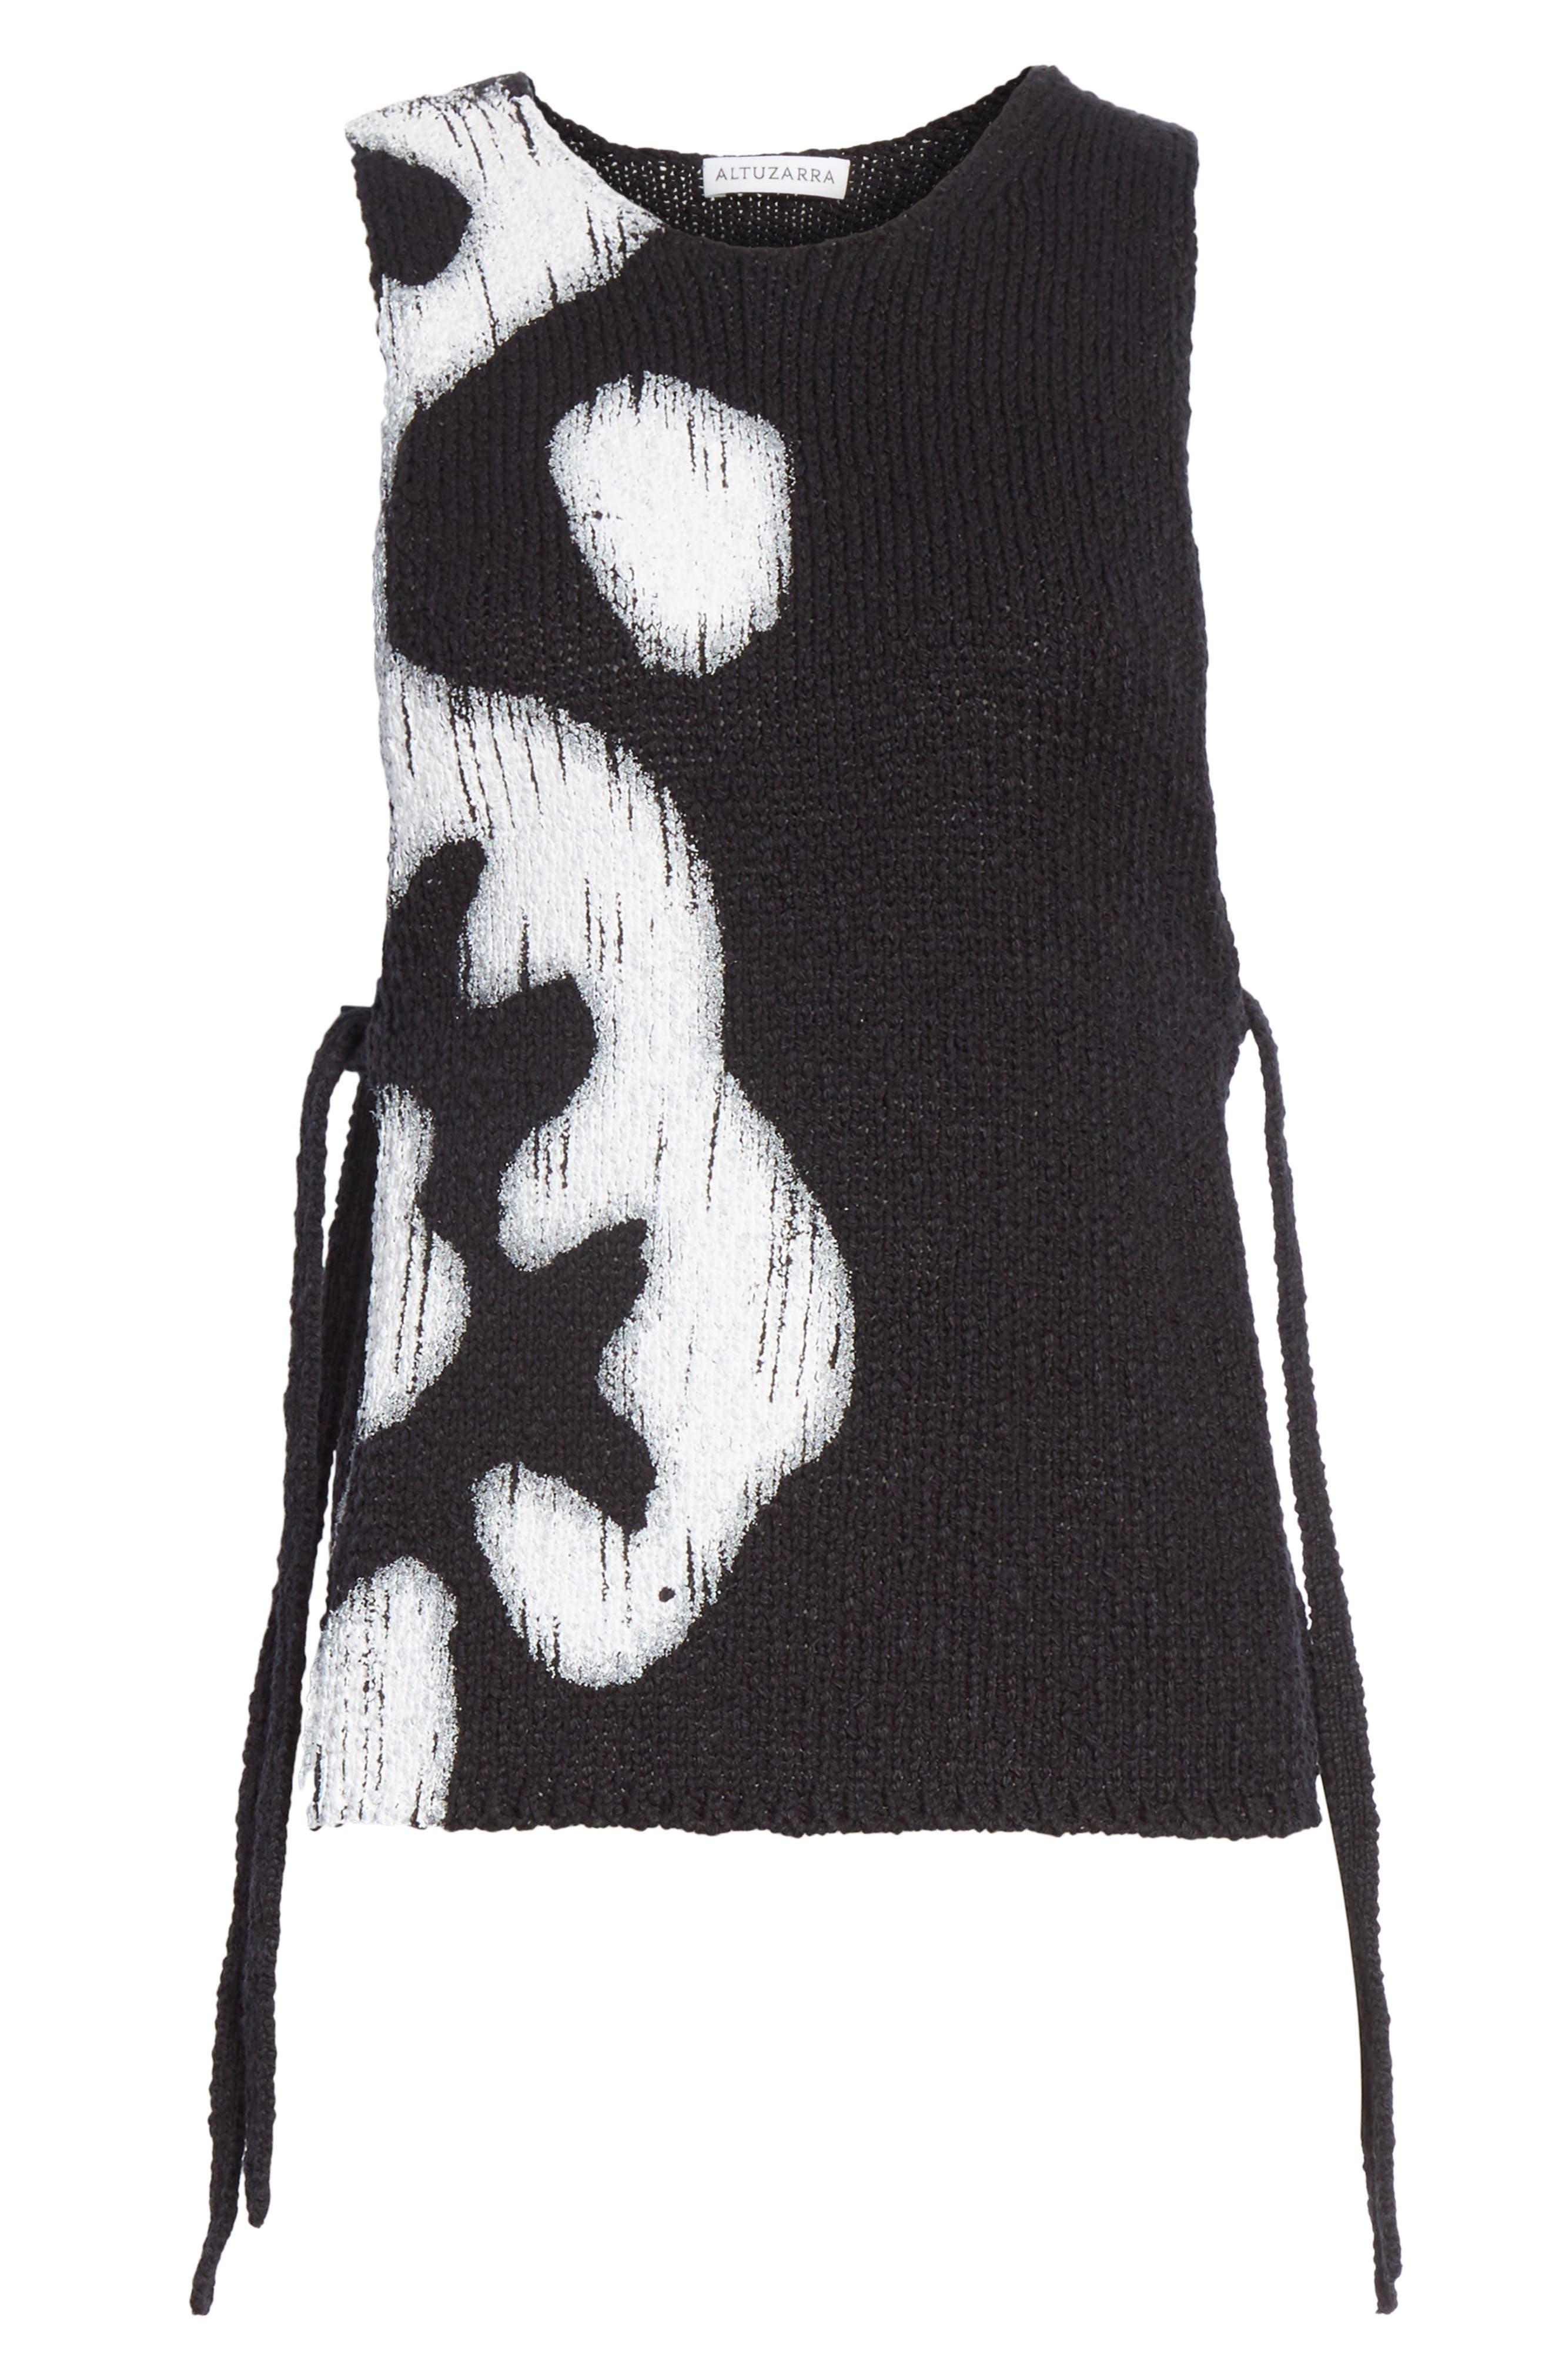 Painted Side Tie Tank Top,                             Alternate thumbnail 7, color,                             Black